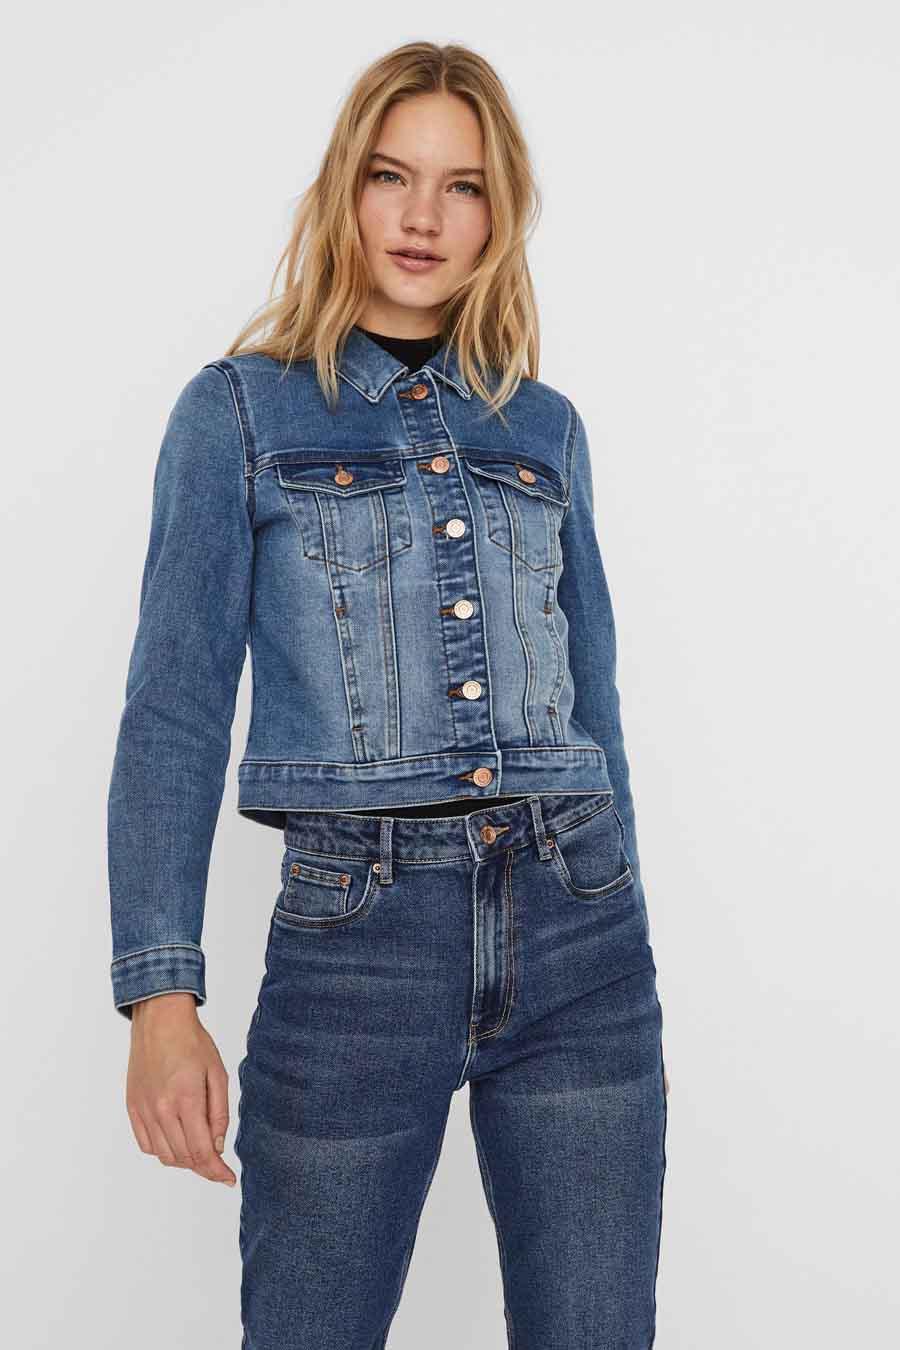 Vero Moda® Jeansjas, Denim, Dames, Maat: L/M/S/XL/XS